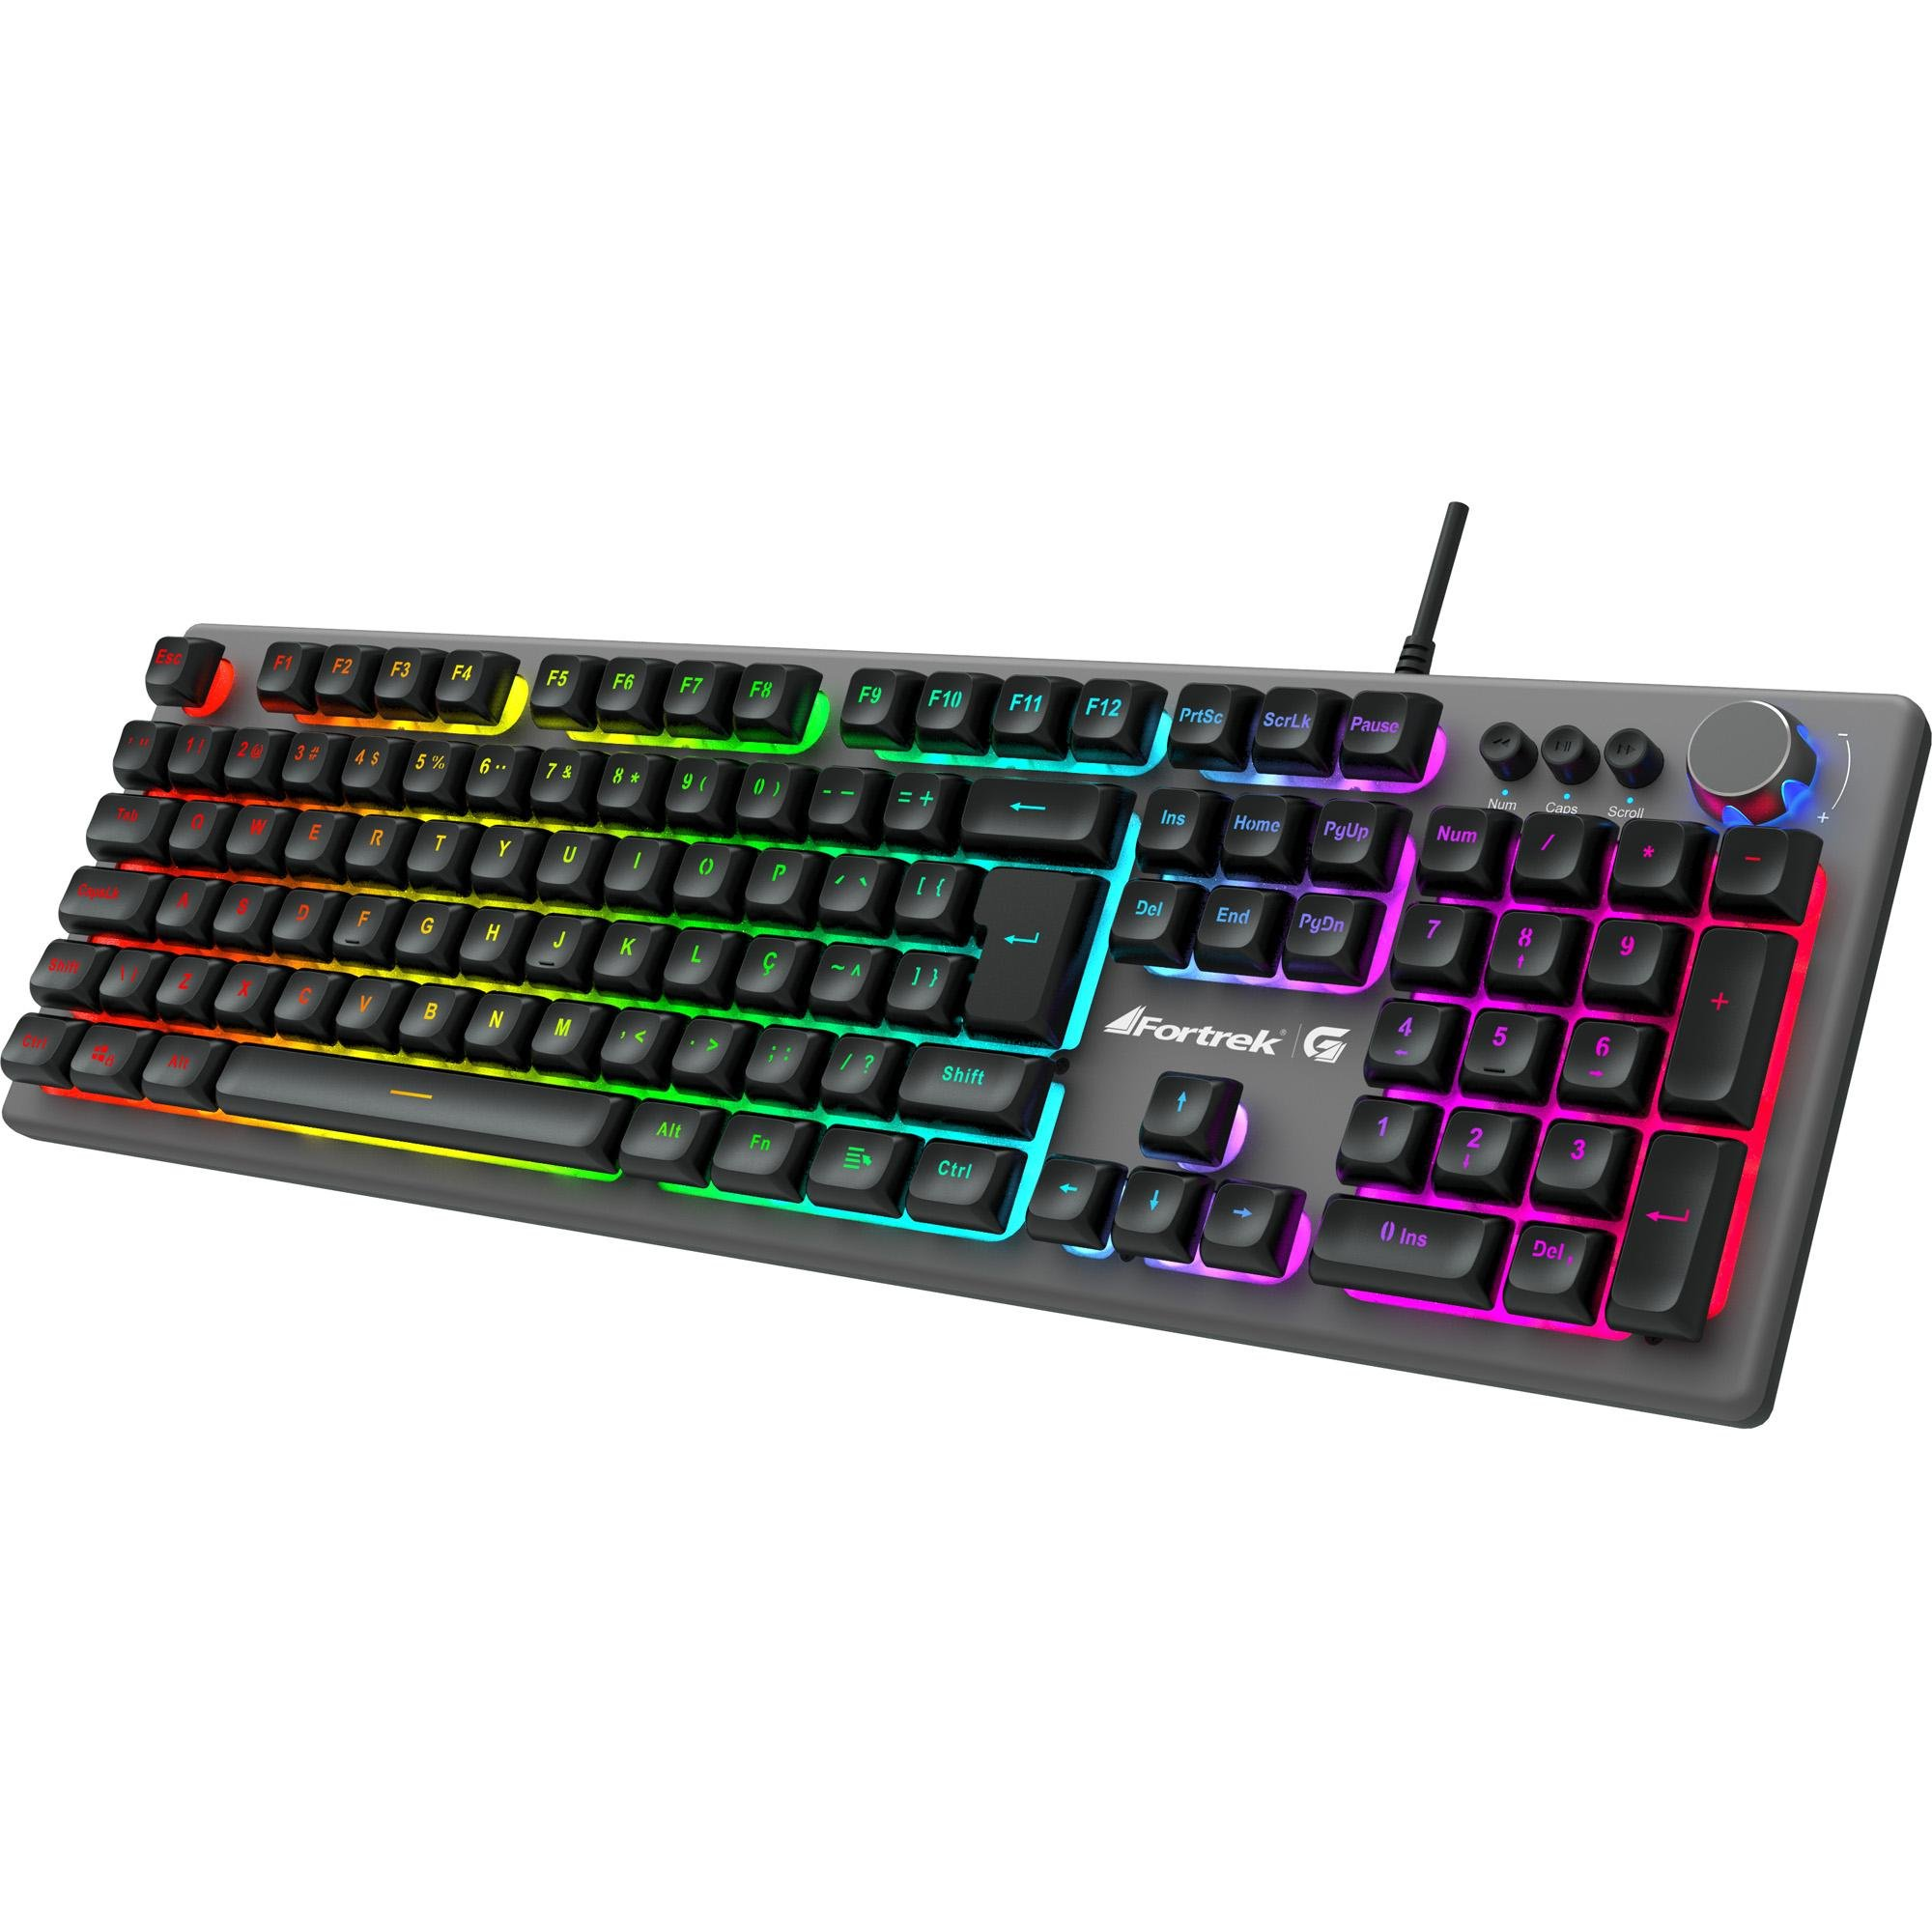 Teclado Gamer RGB Rainbow HOLT Grafite FORTREK